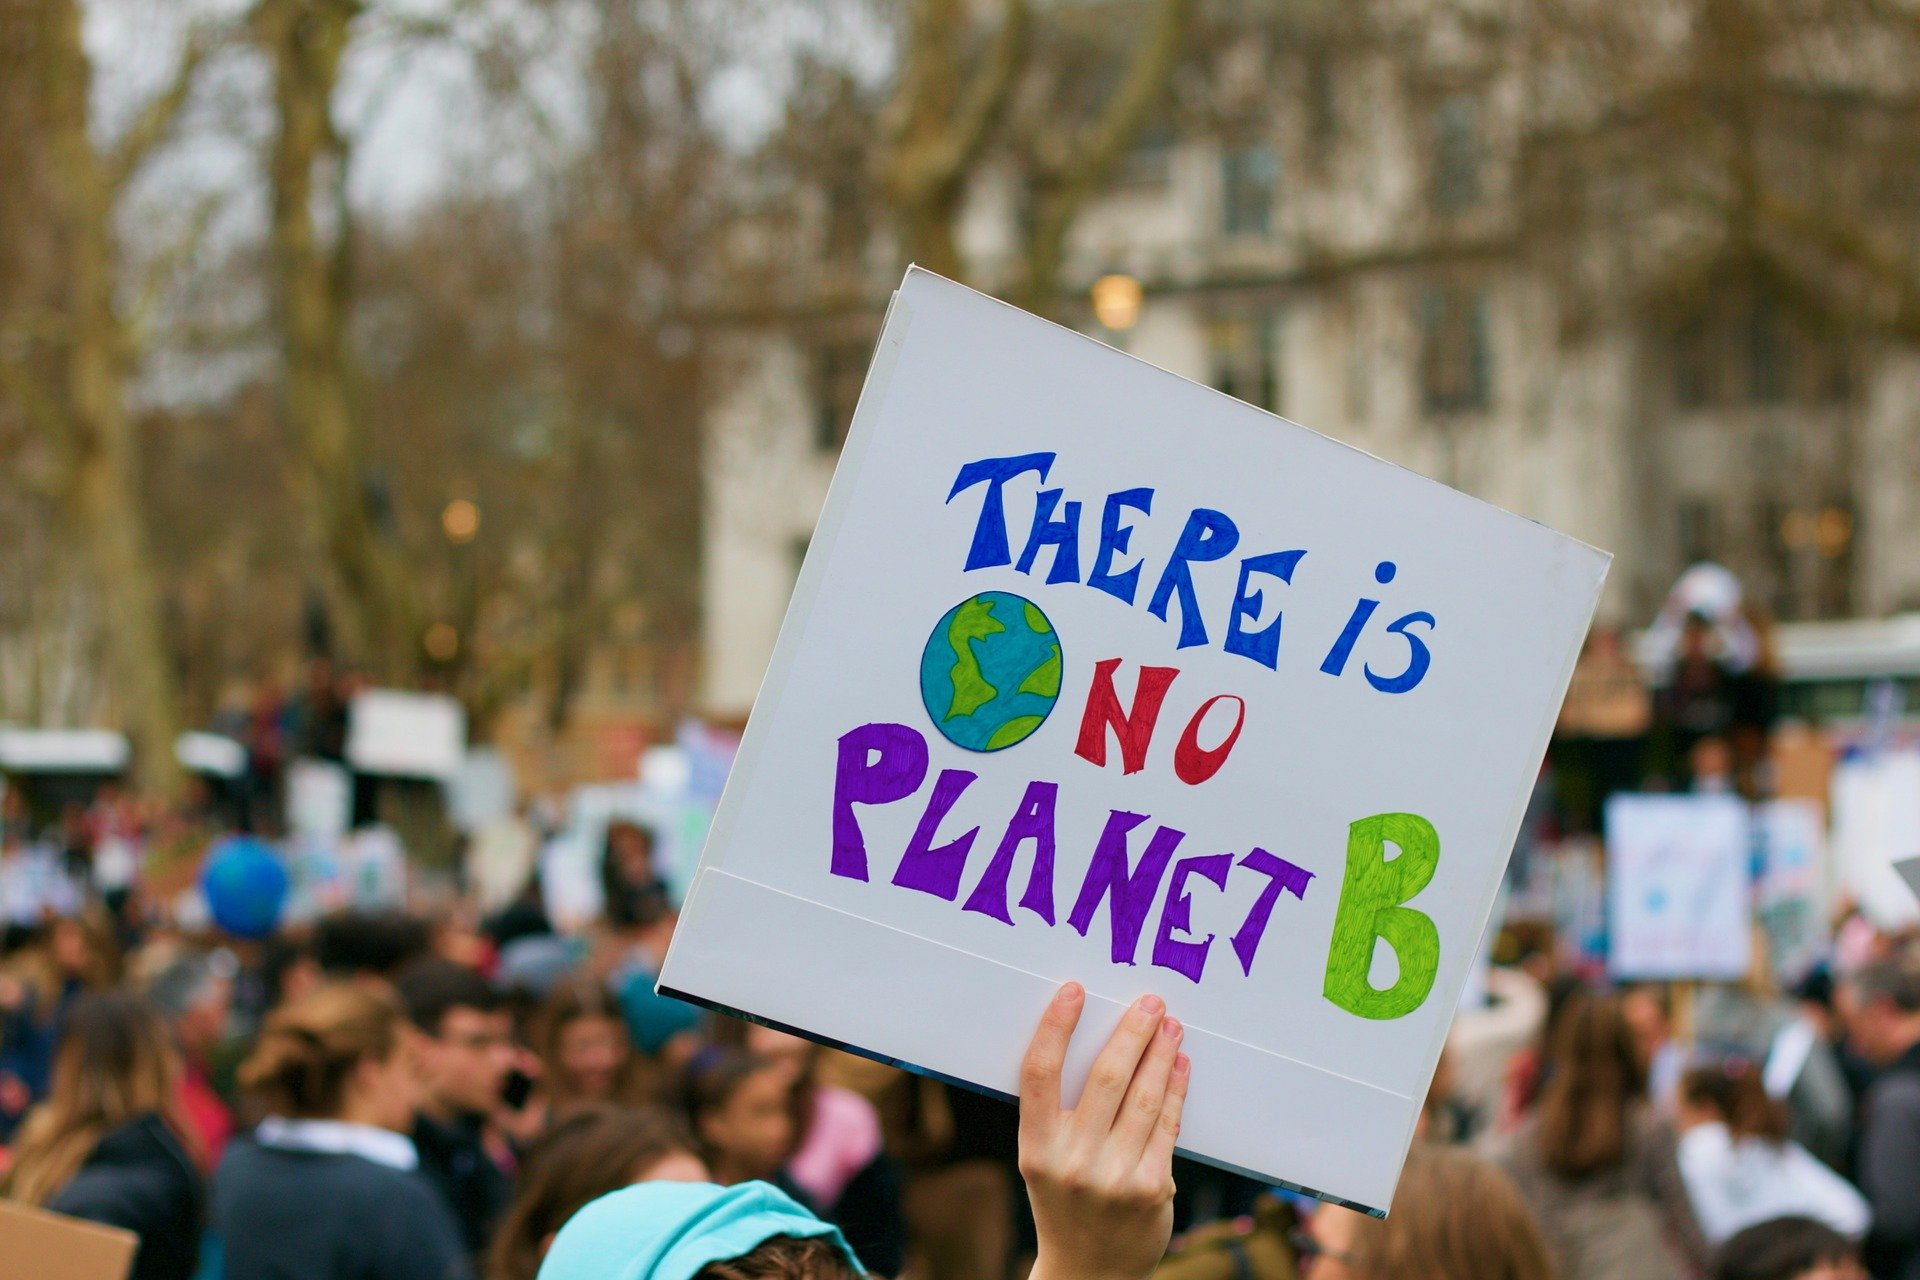 pacte social et environnemental